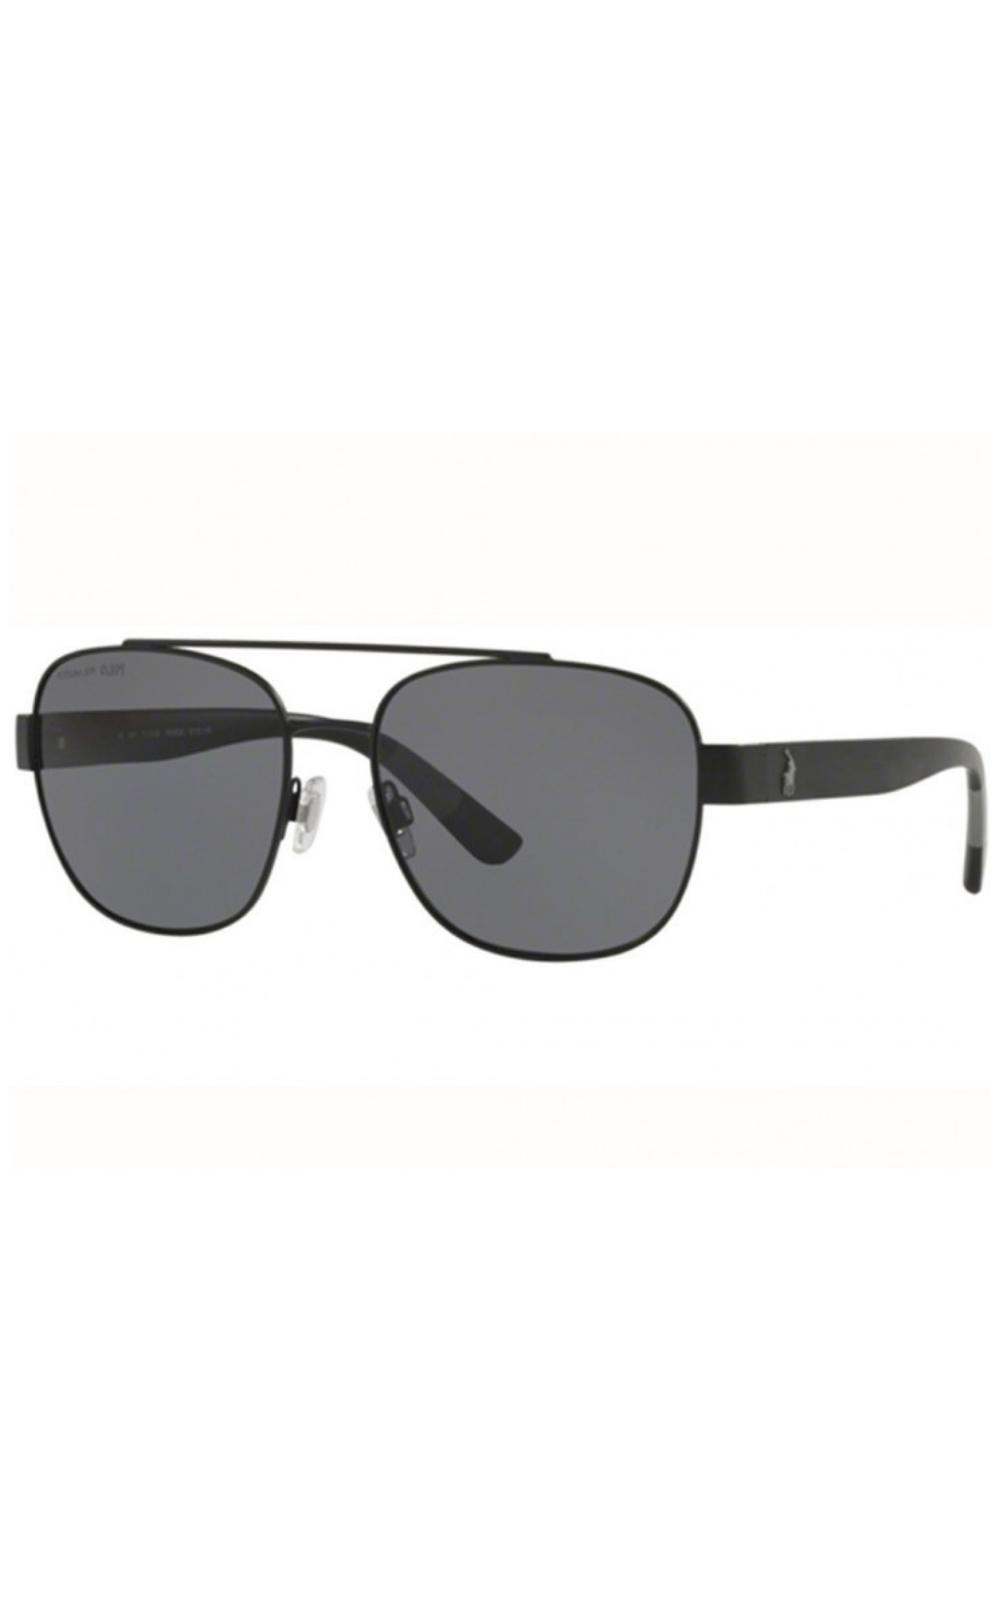 Foto 1 - Óculos de Sol Polo Ralph Lauren 3119 9267/81 Polarizado